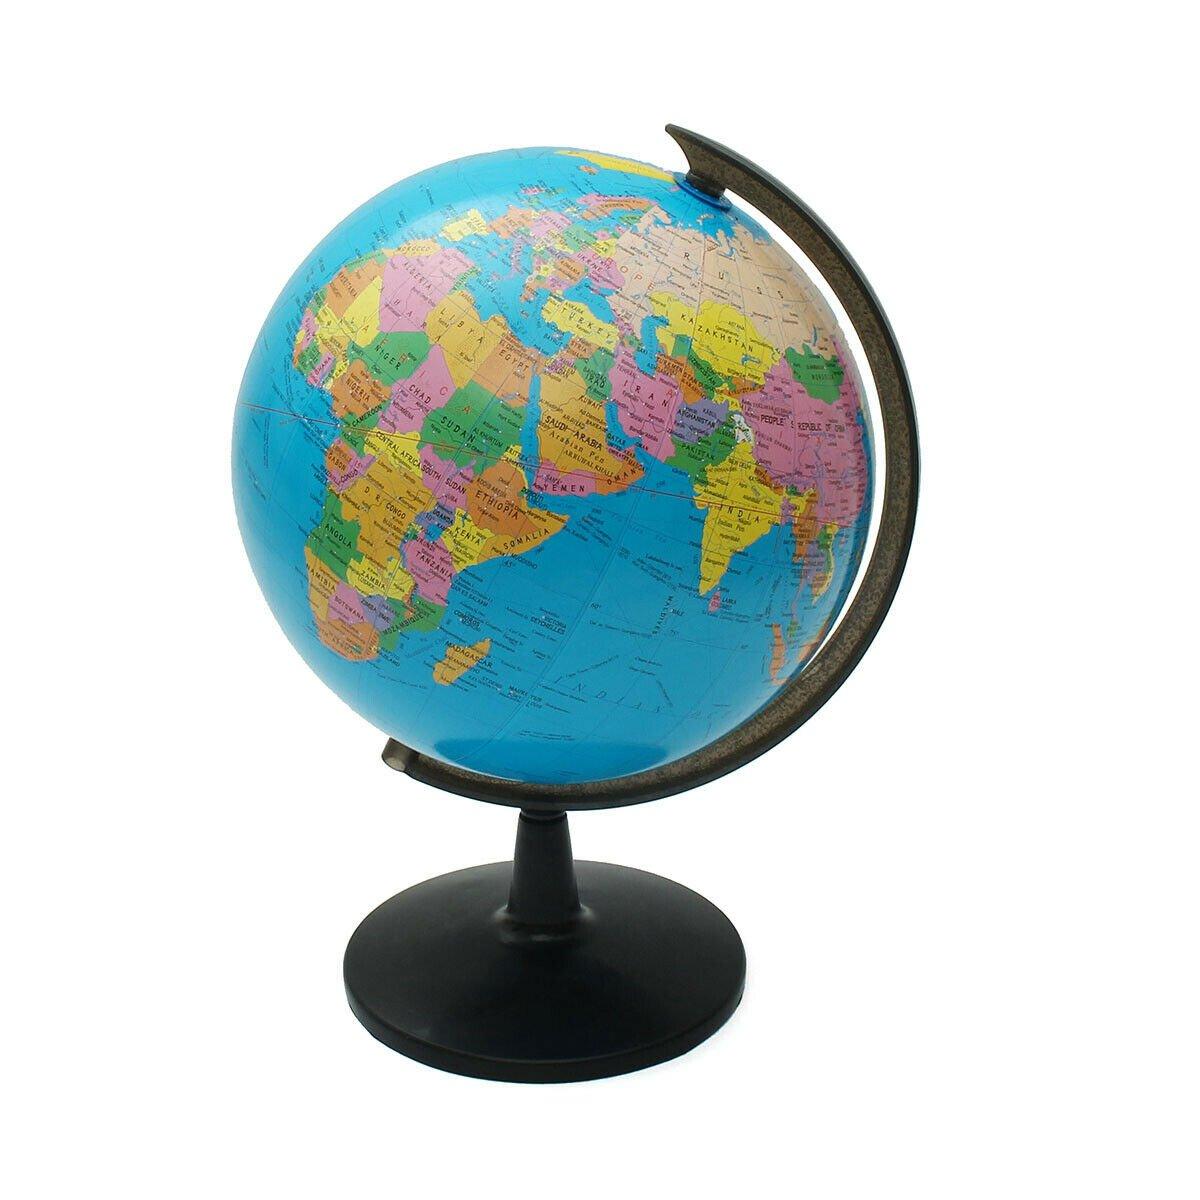 32cm Rotating World Earth Globe Atlas Map Geography Education Toy Desktop Decor